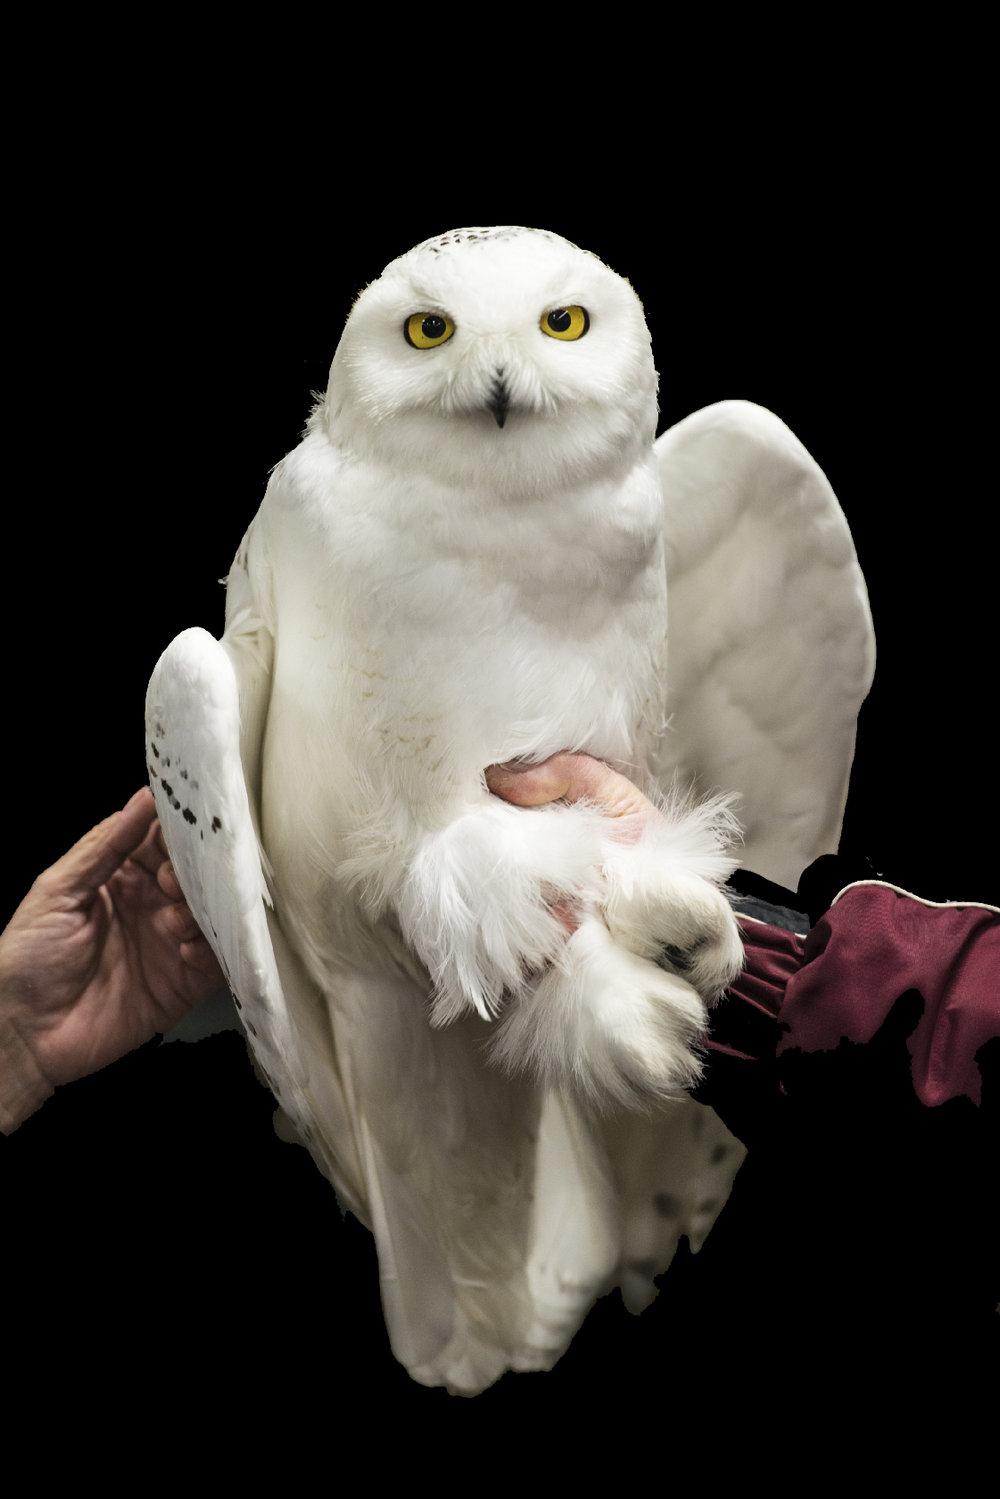 Goose The Owl_Richard Armstrong.jpg